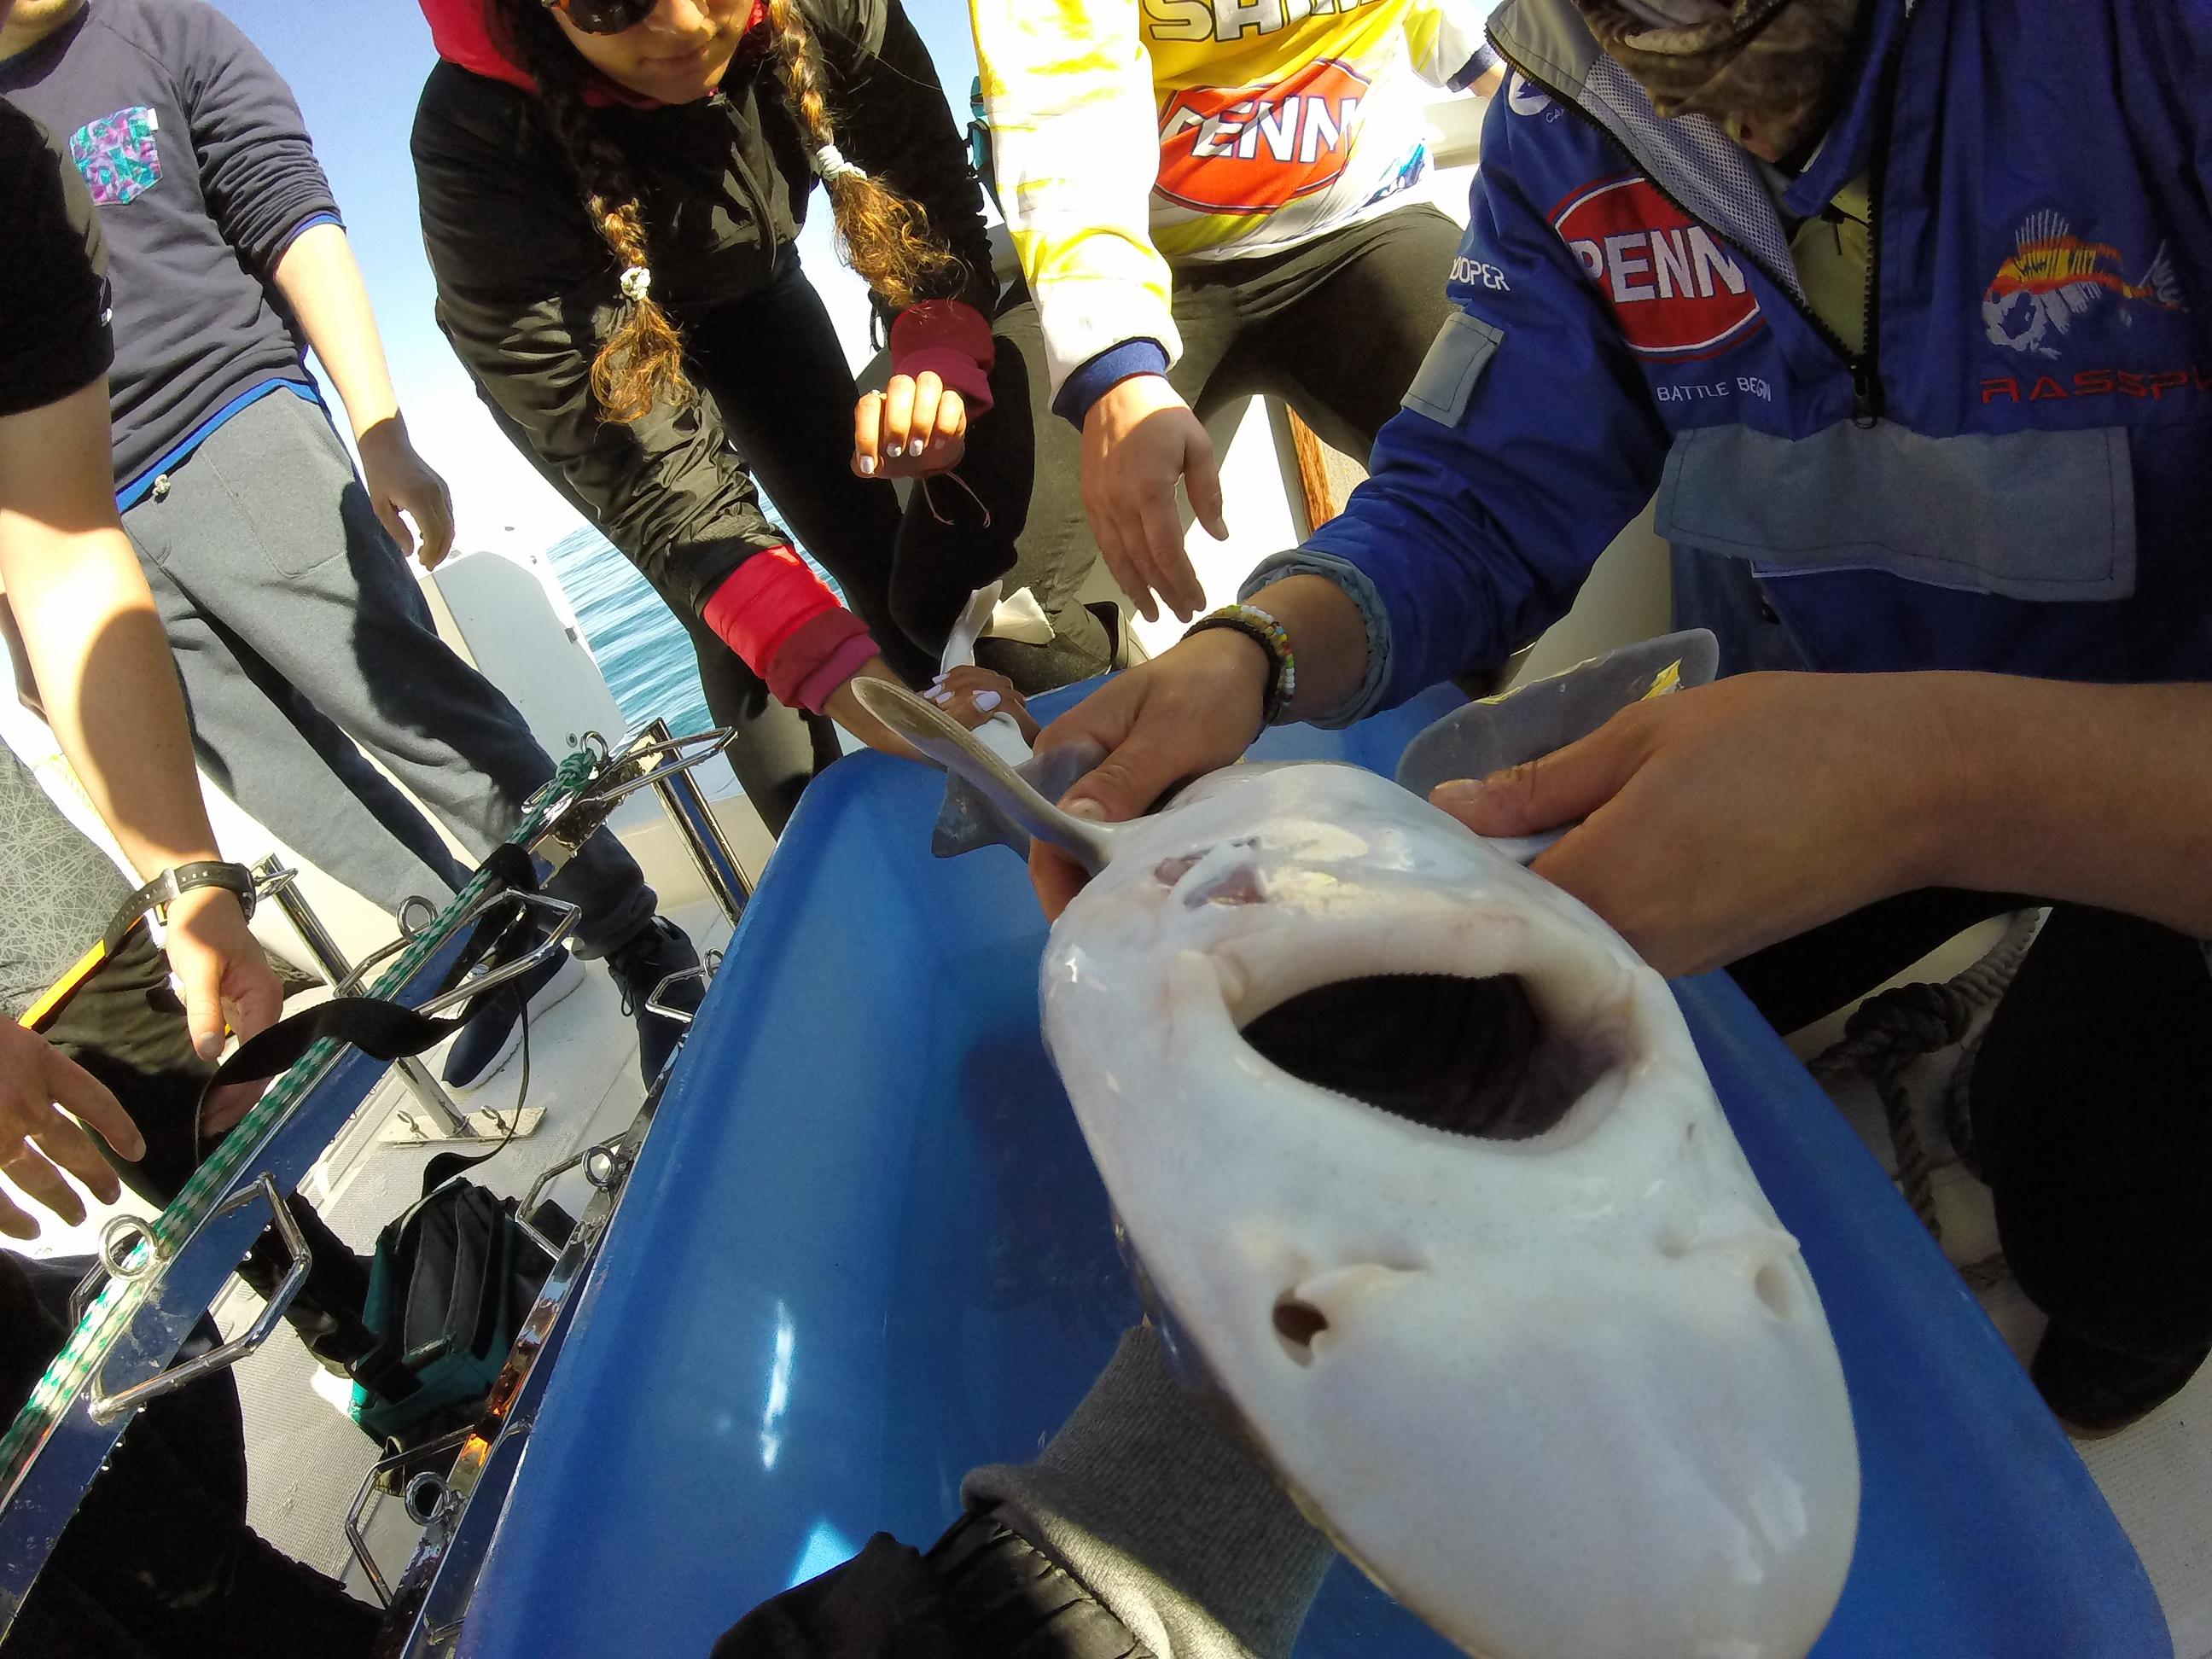 Volunteereco.org Volunteer for Sharks in South Africa